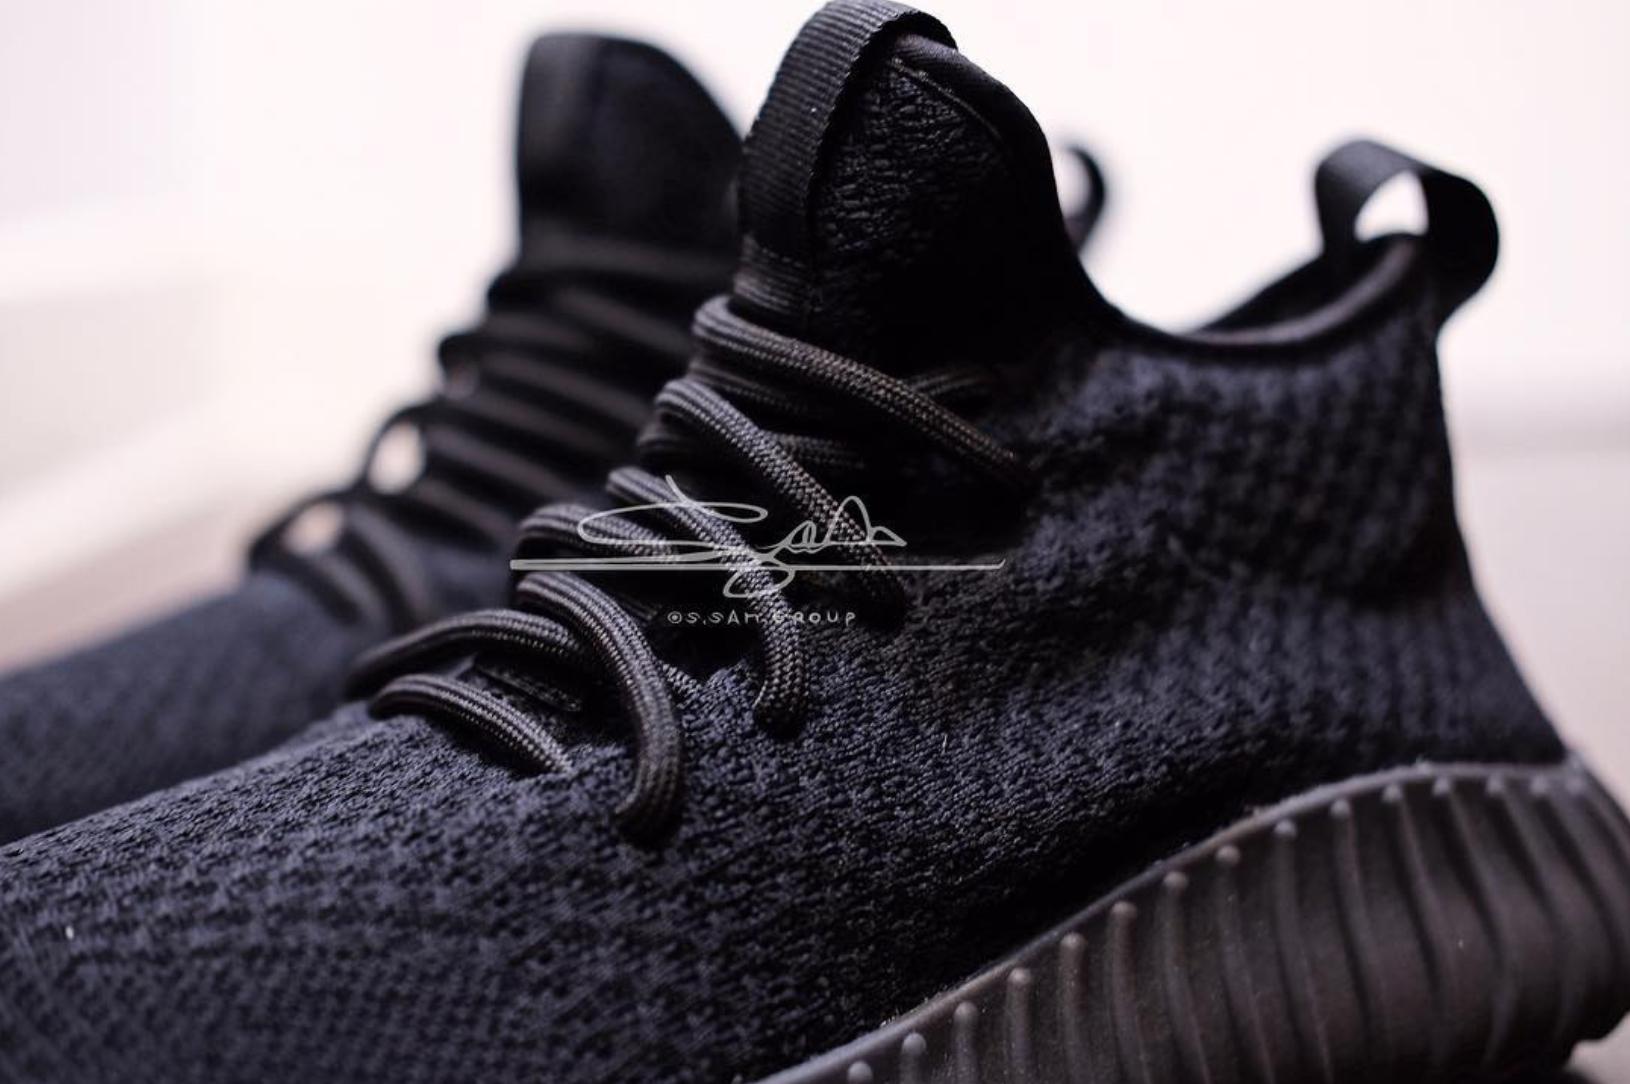 f41beb0a3e7df9 adidas yeezy boost 650 black 5 - WearTesters